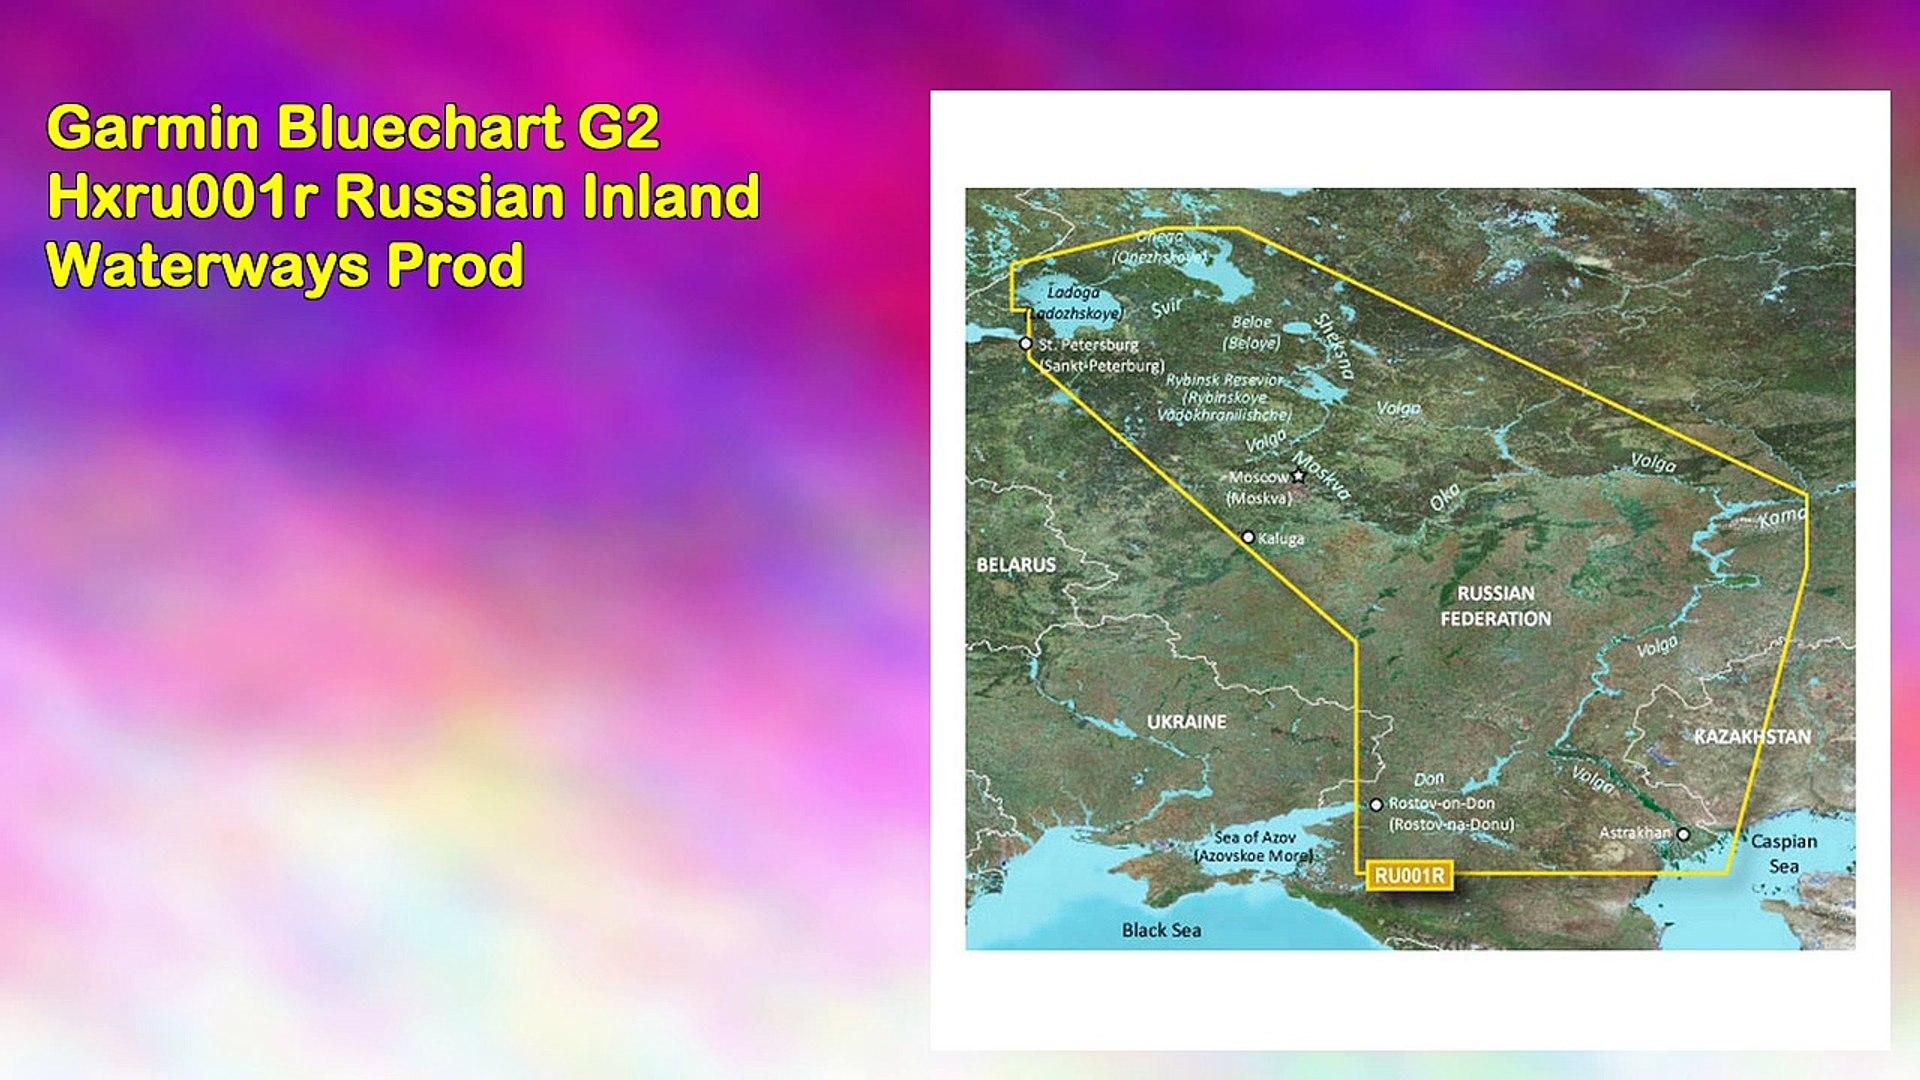 Garmin Bluechart G2 Hxru001r Russian Inland Waterways Prod